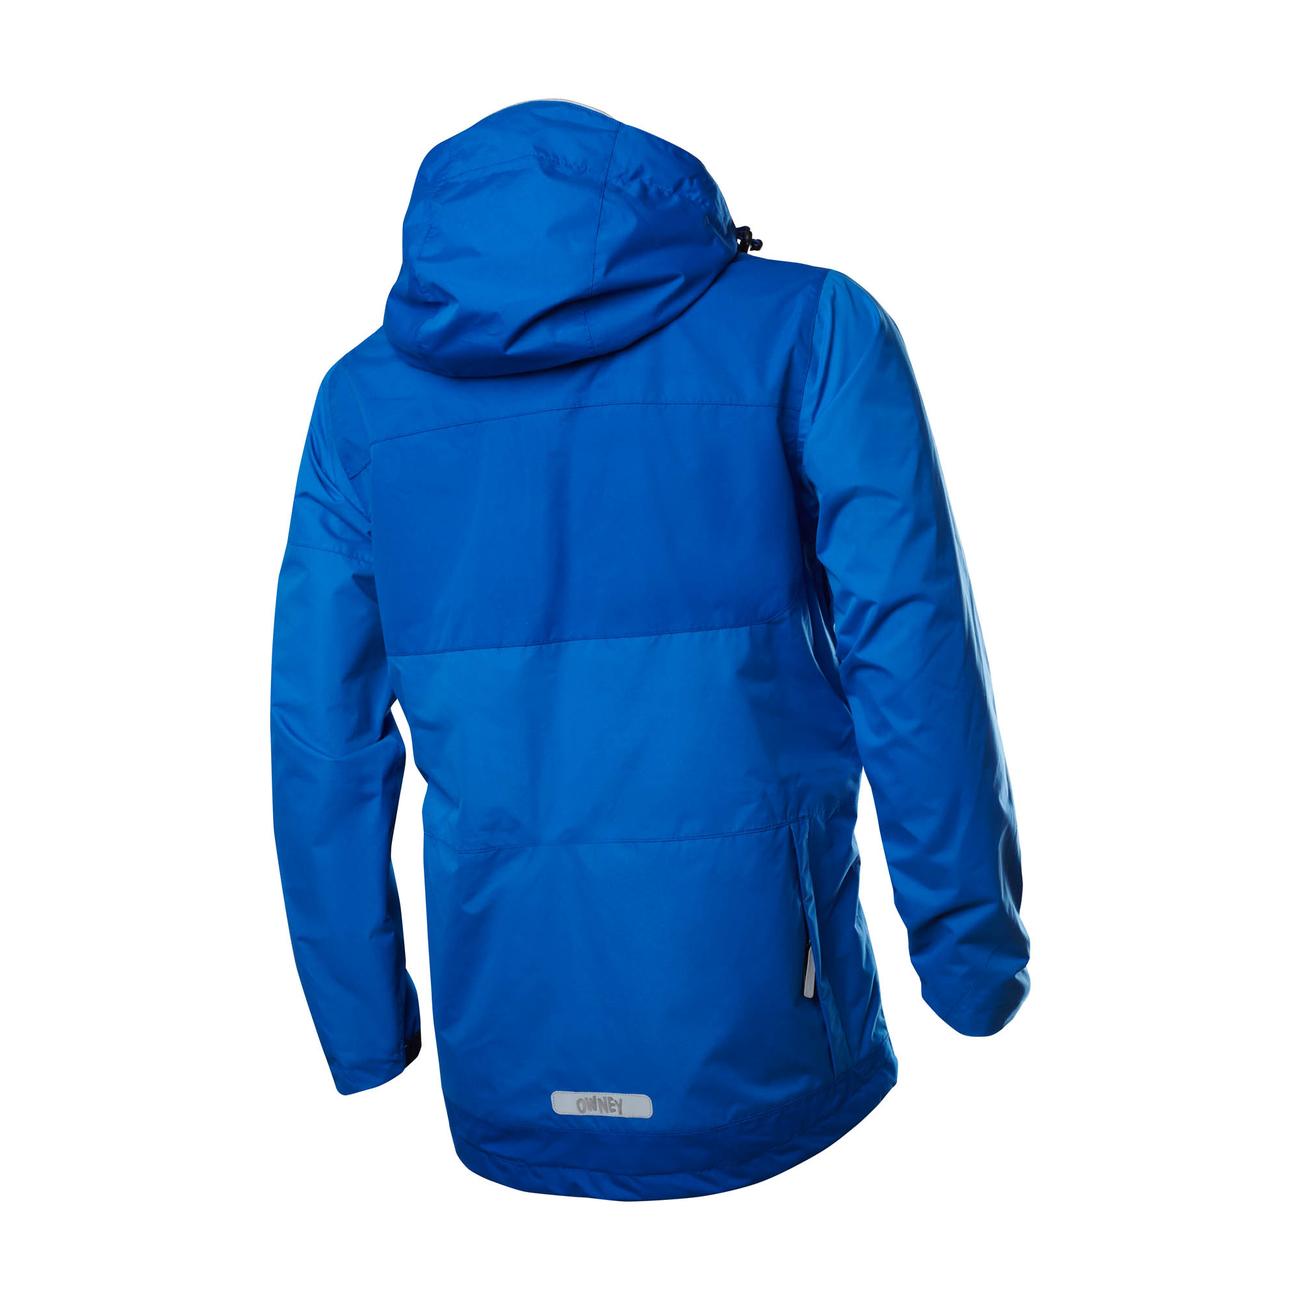 Owney Nova Jacket für Männer, Bild 2